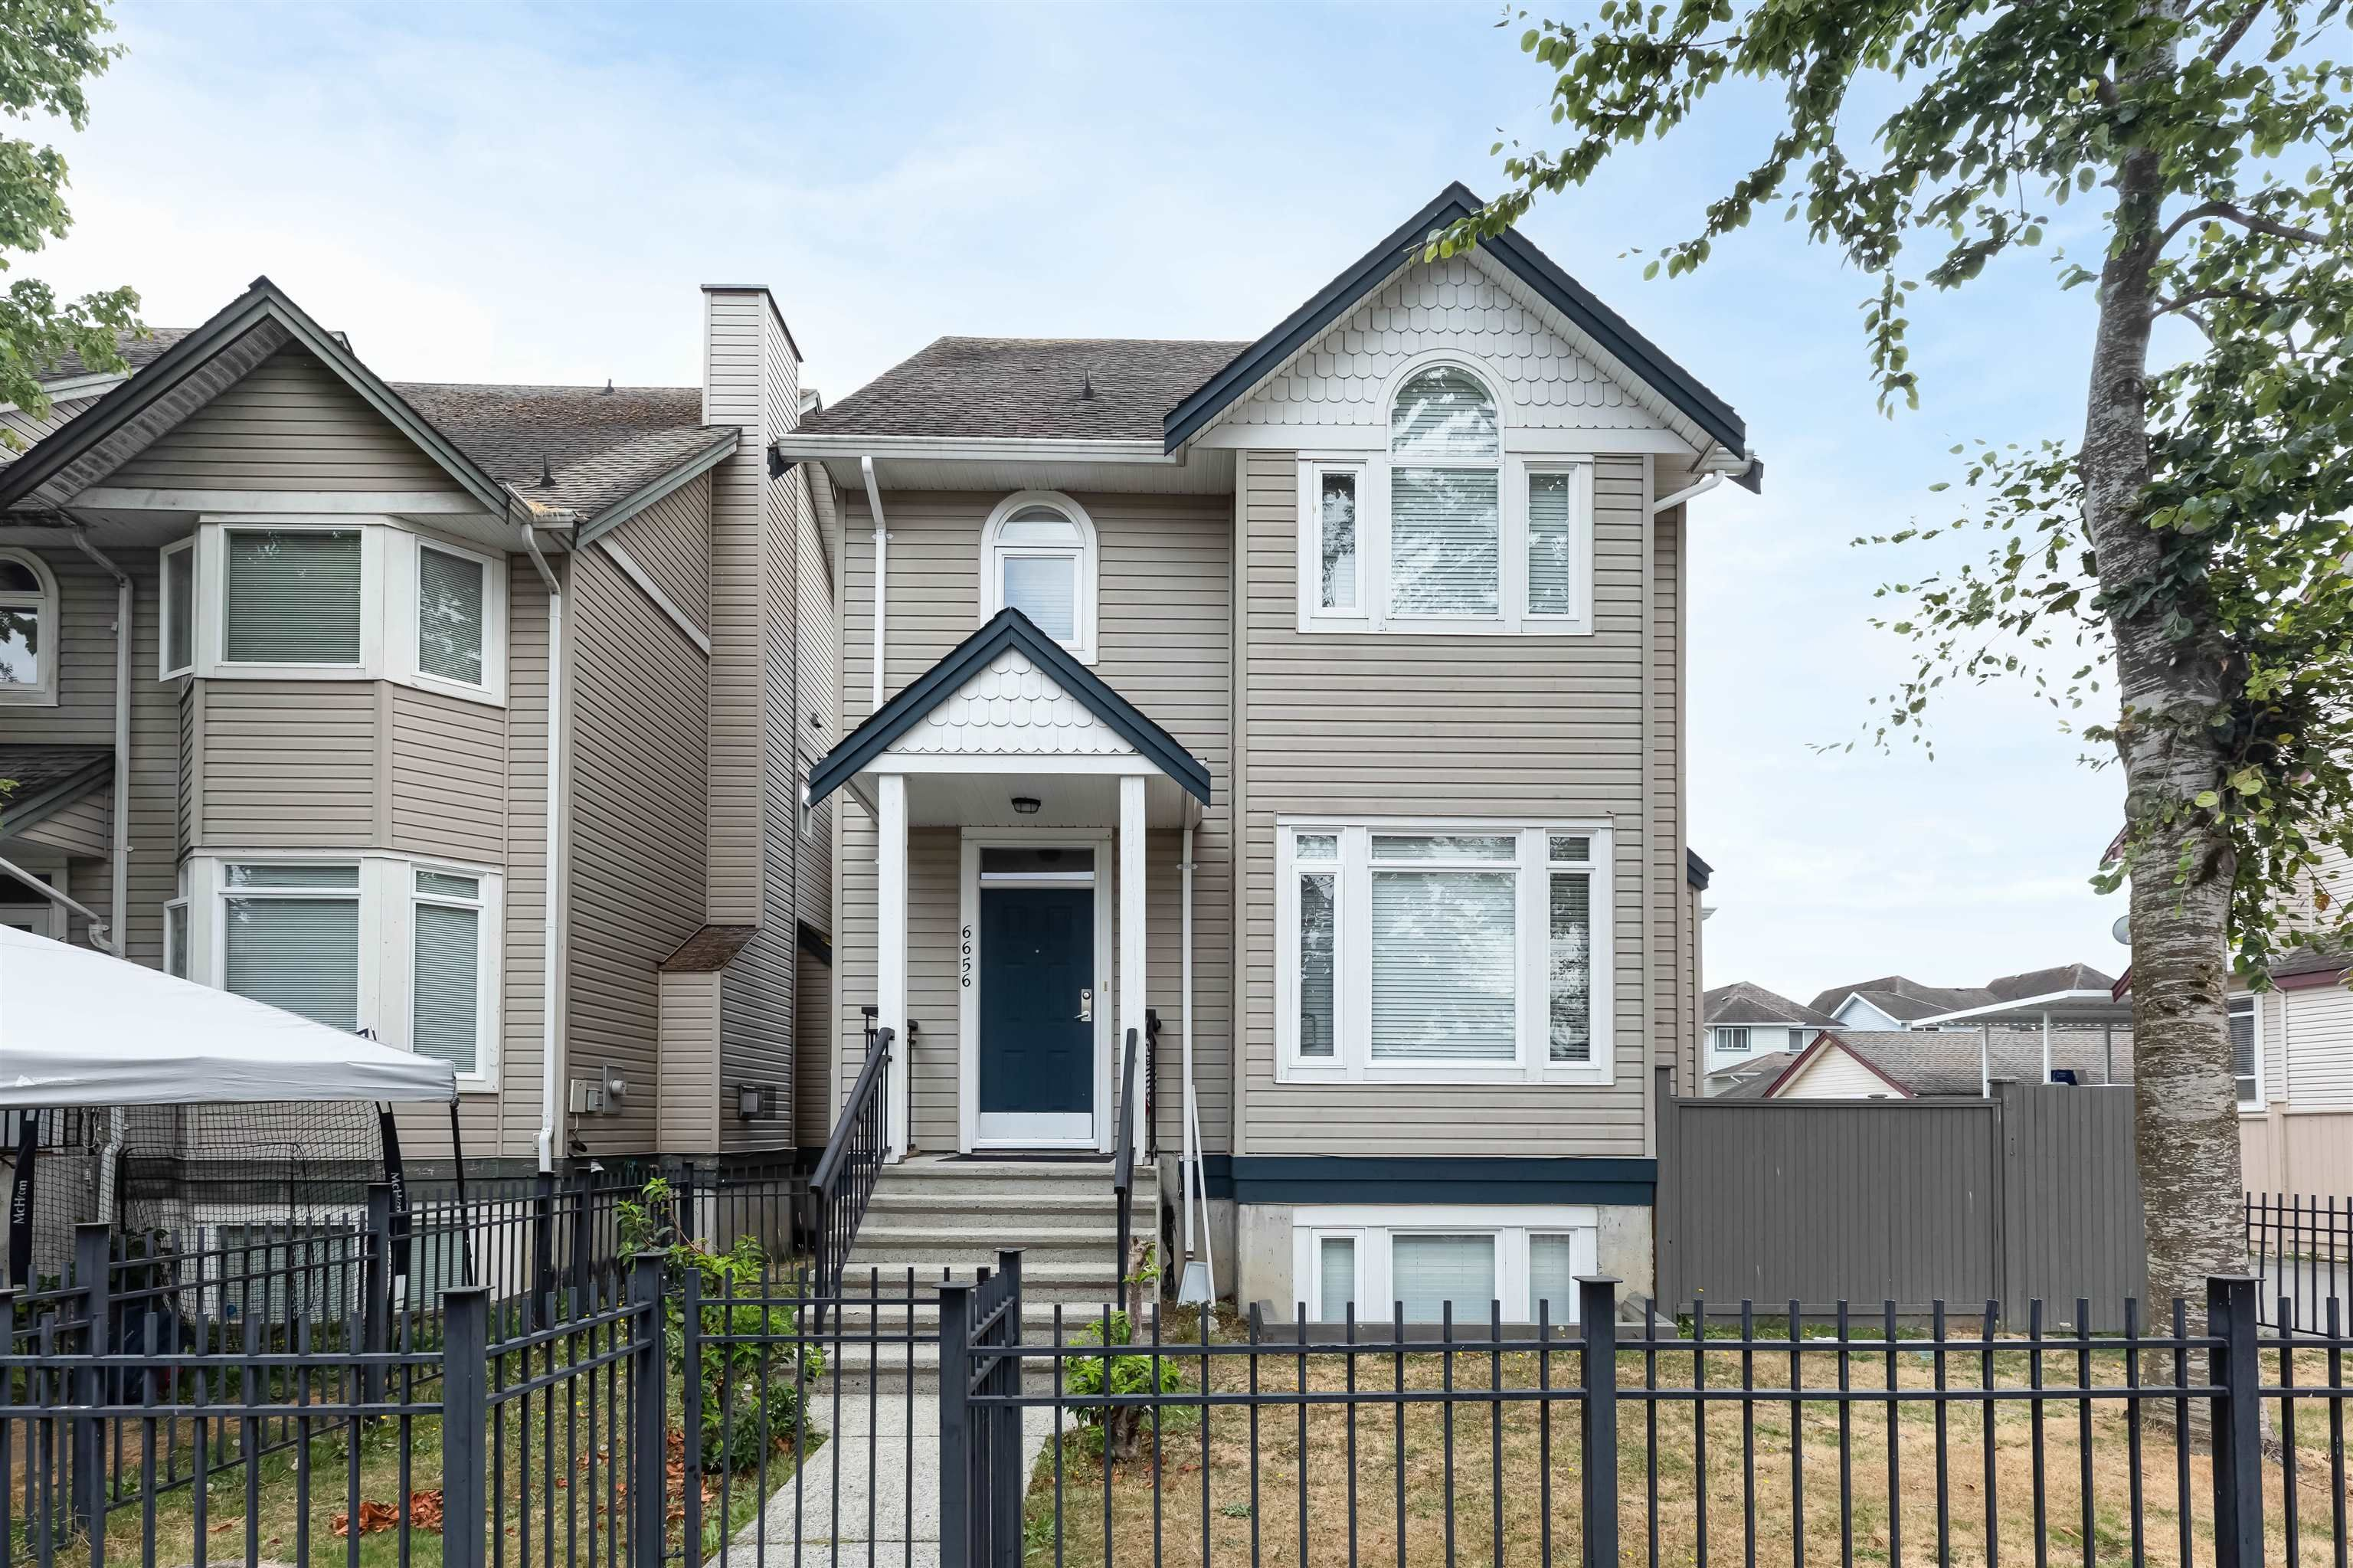 Main Photo: 6656 E HAMPTON Boulevard in Surrey: West Newton House for sale : MLS®# R2611217